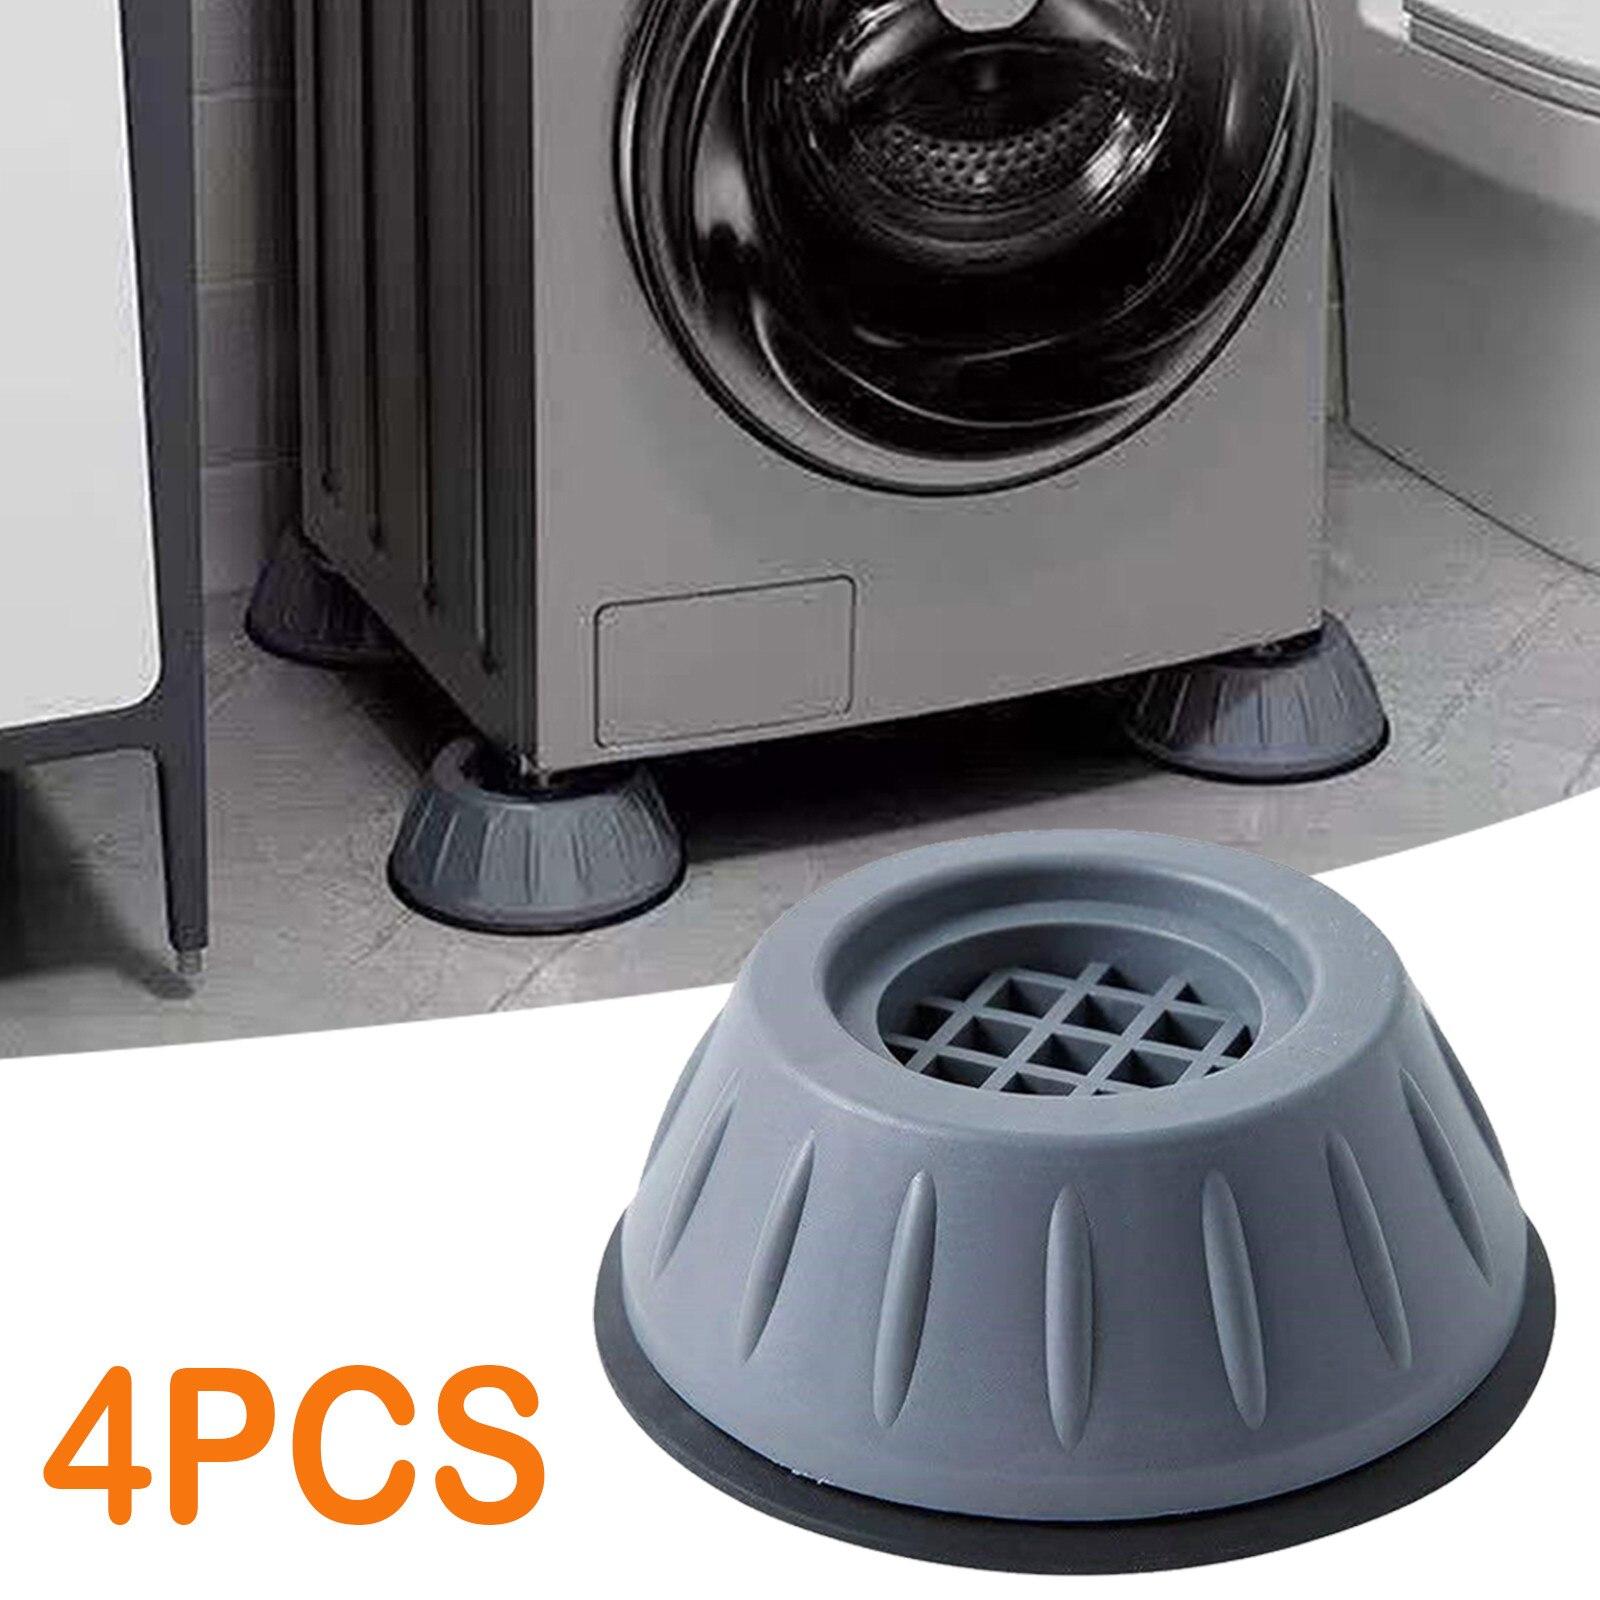 4pcs Washing Machine Anti-vibration Mute Protection Mat Durable Anti-skid Foot Pad Home Decoration Accessories